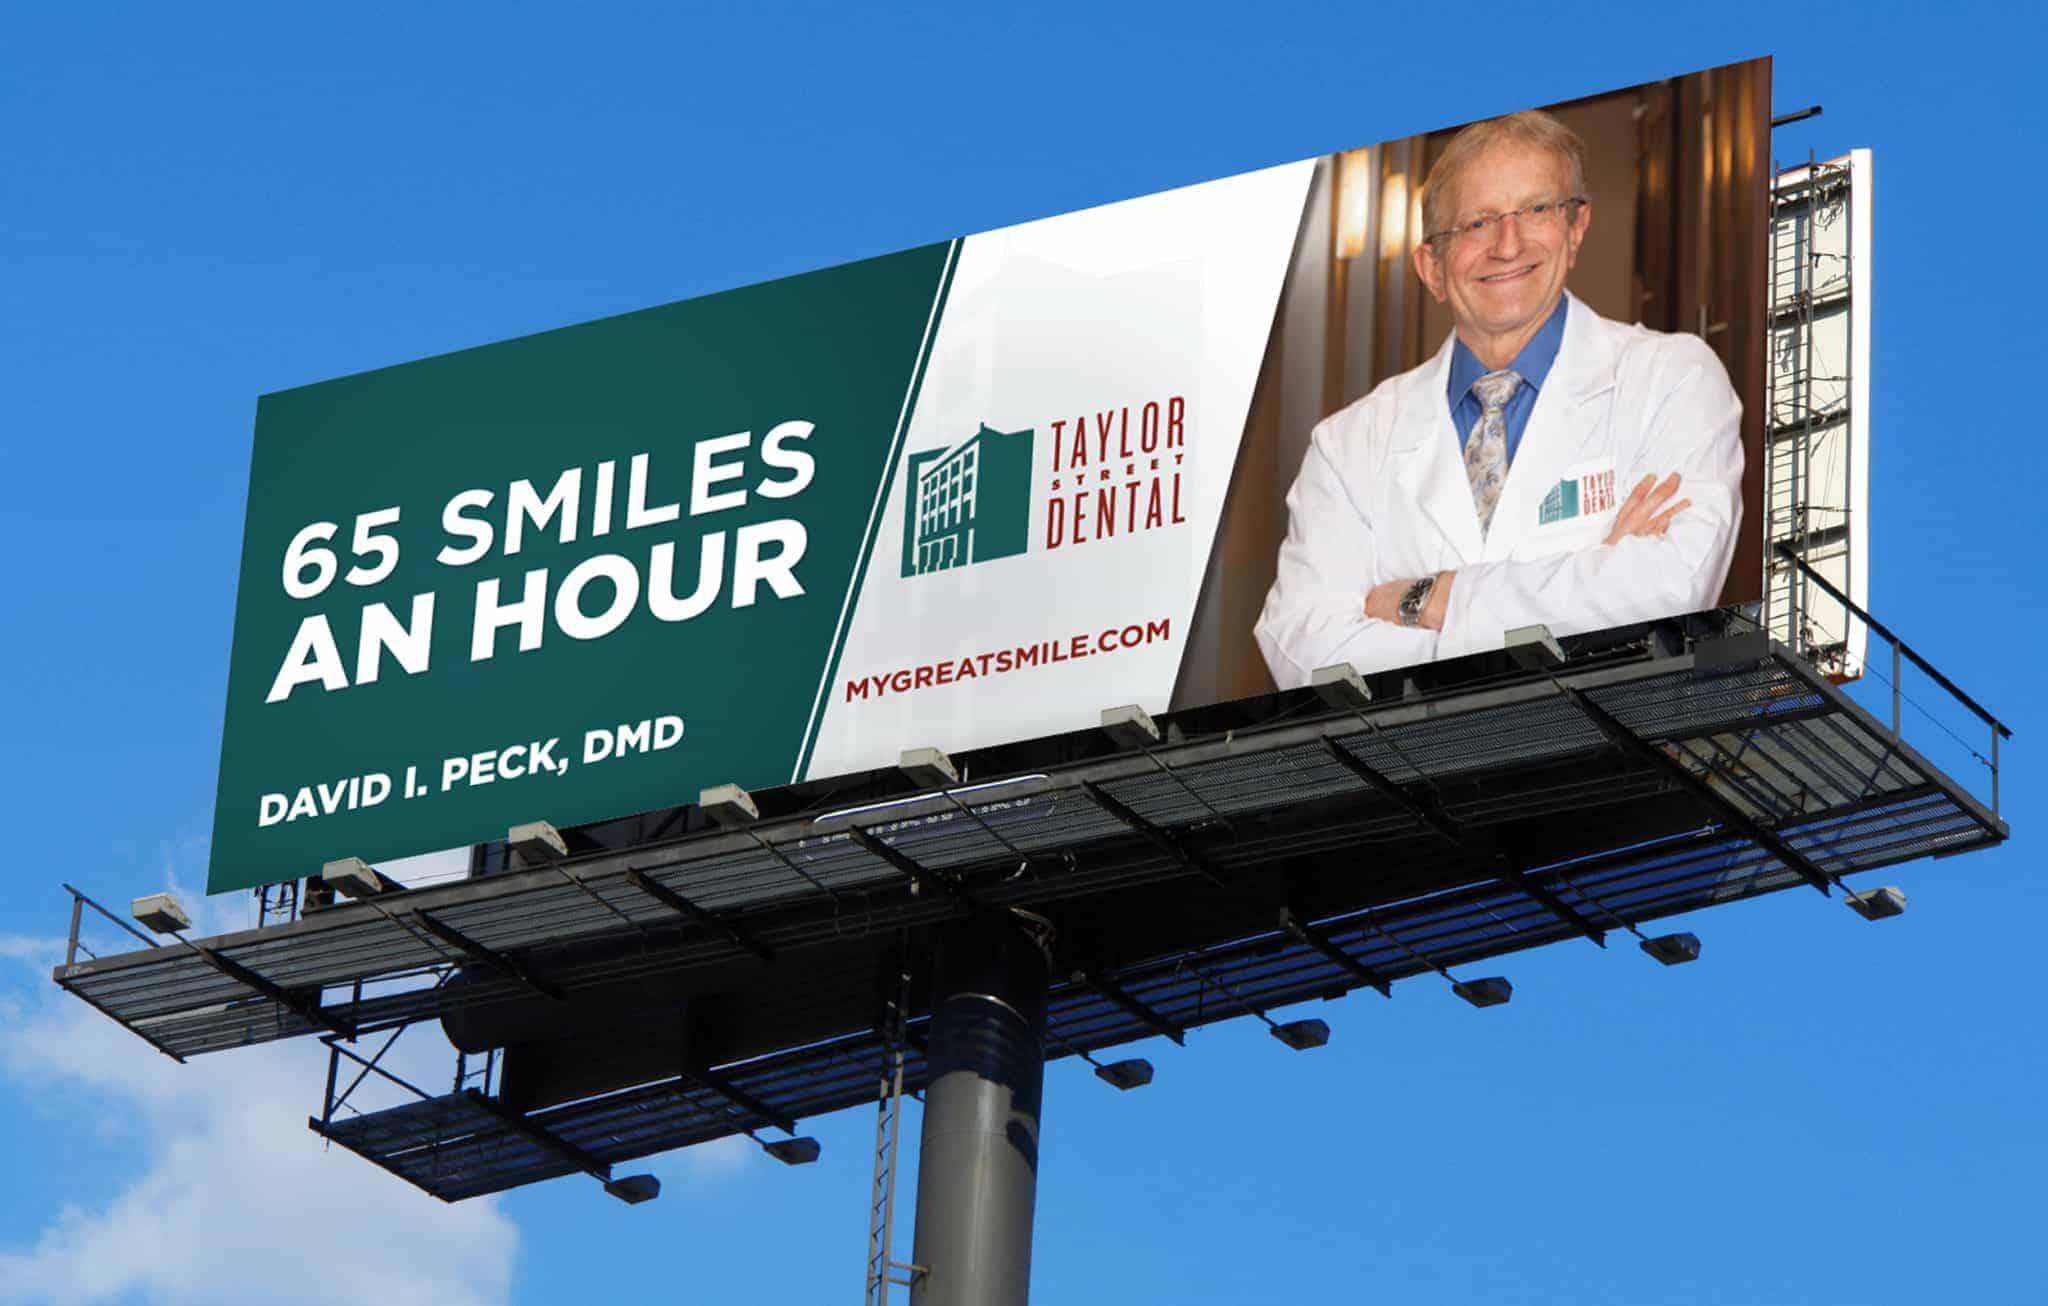 Taylor Dental Billboard